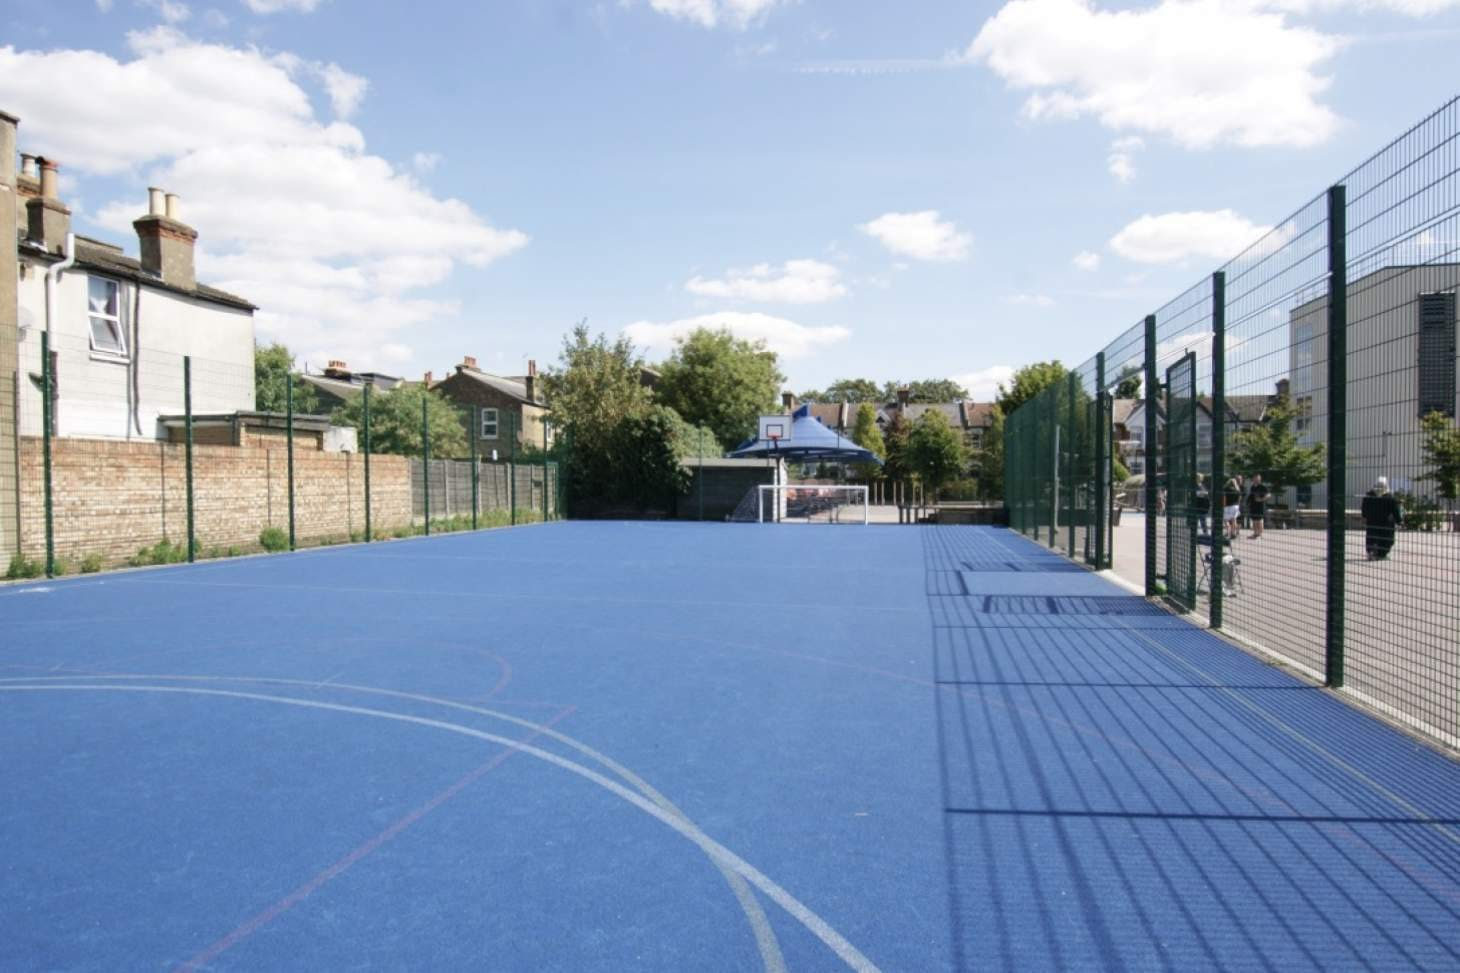 George Tomlinson Primary School Outdoor | Hard (macadam) basketball court